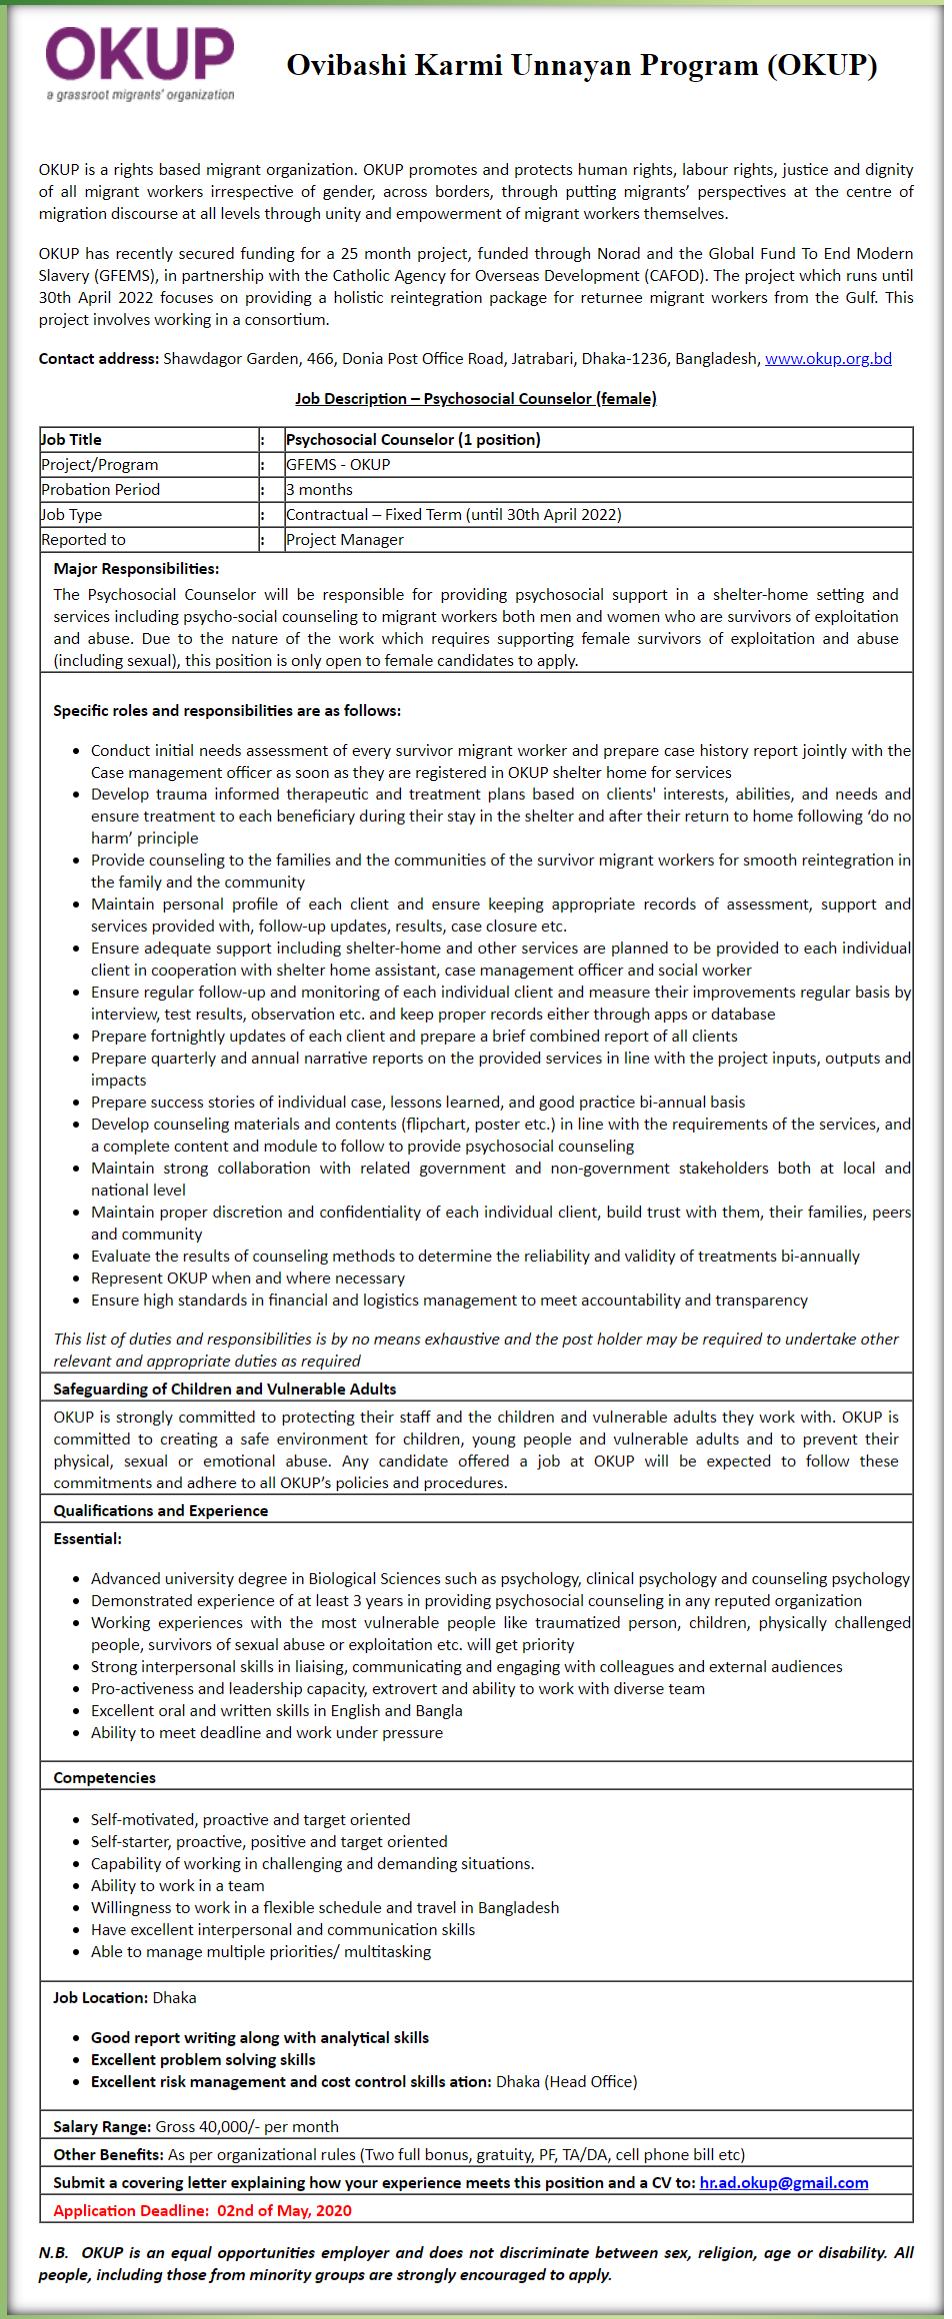 Ovibashi Karmi Unnayan Program (OKUP) Job Circular 2020